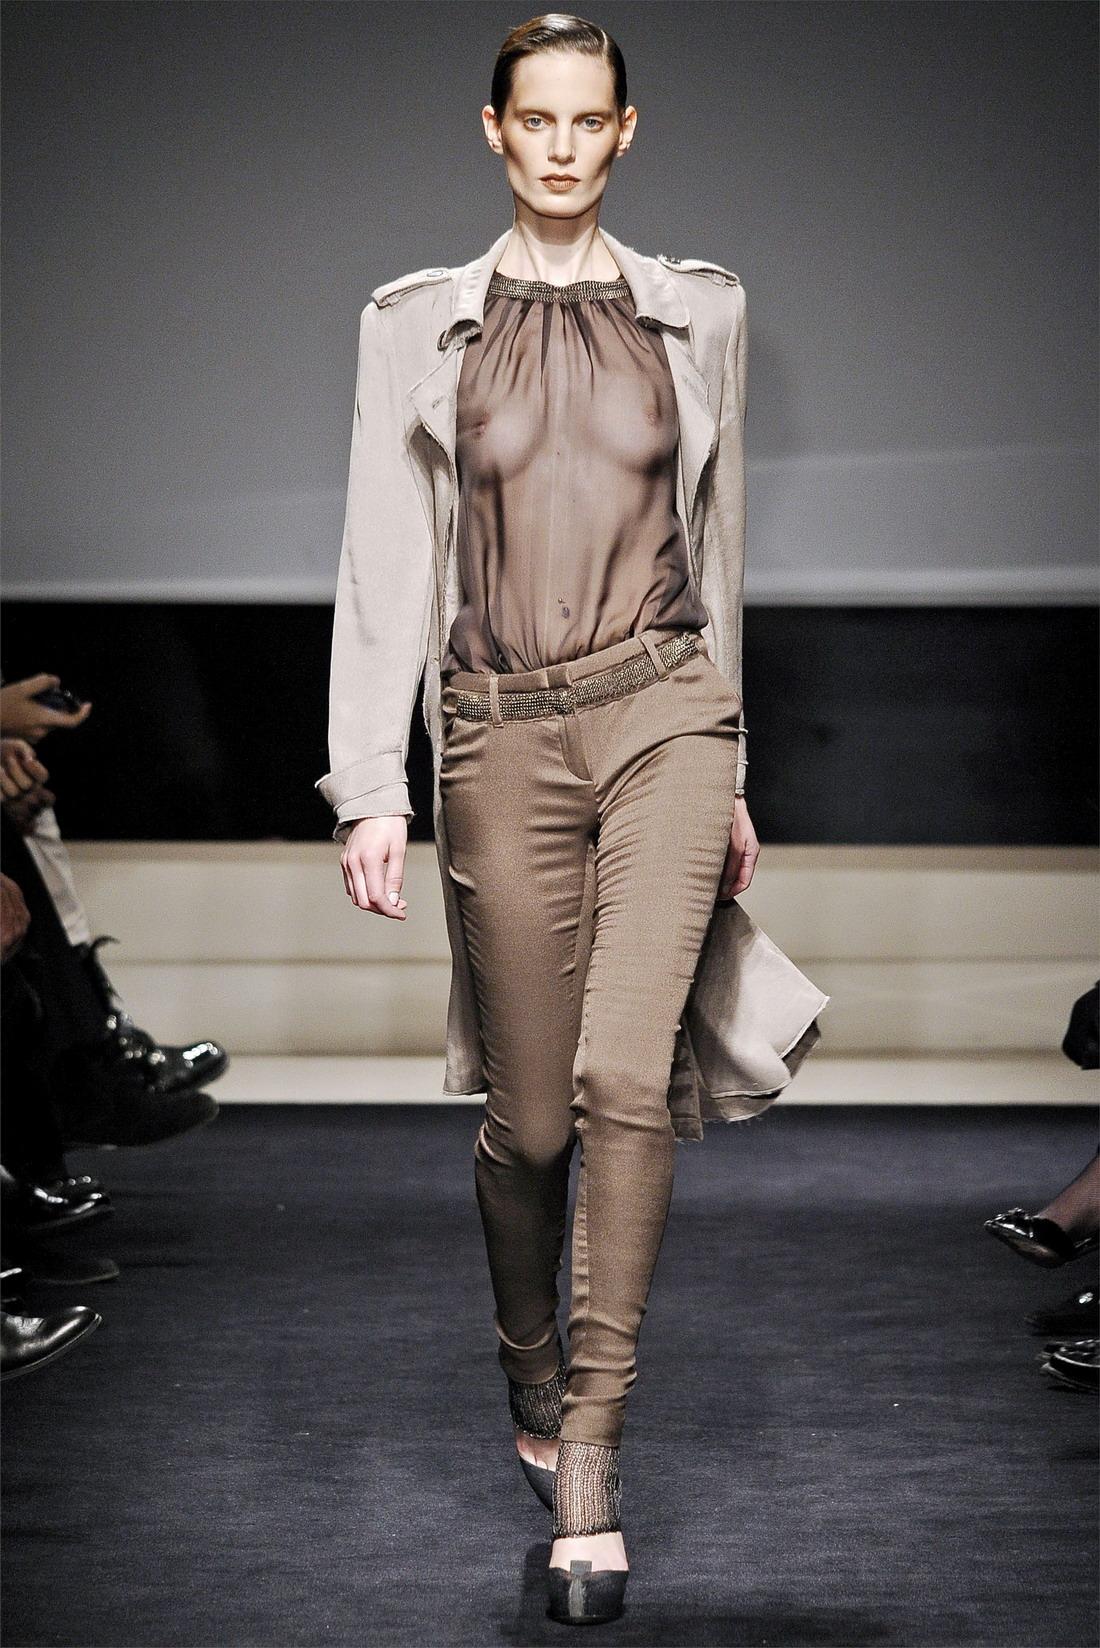 Голая мода франции вот